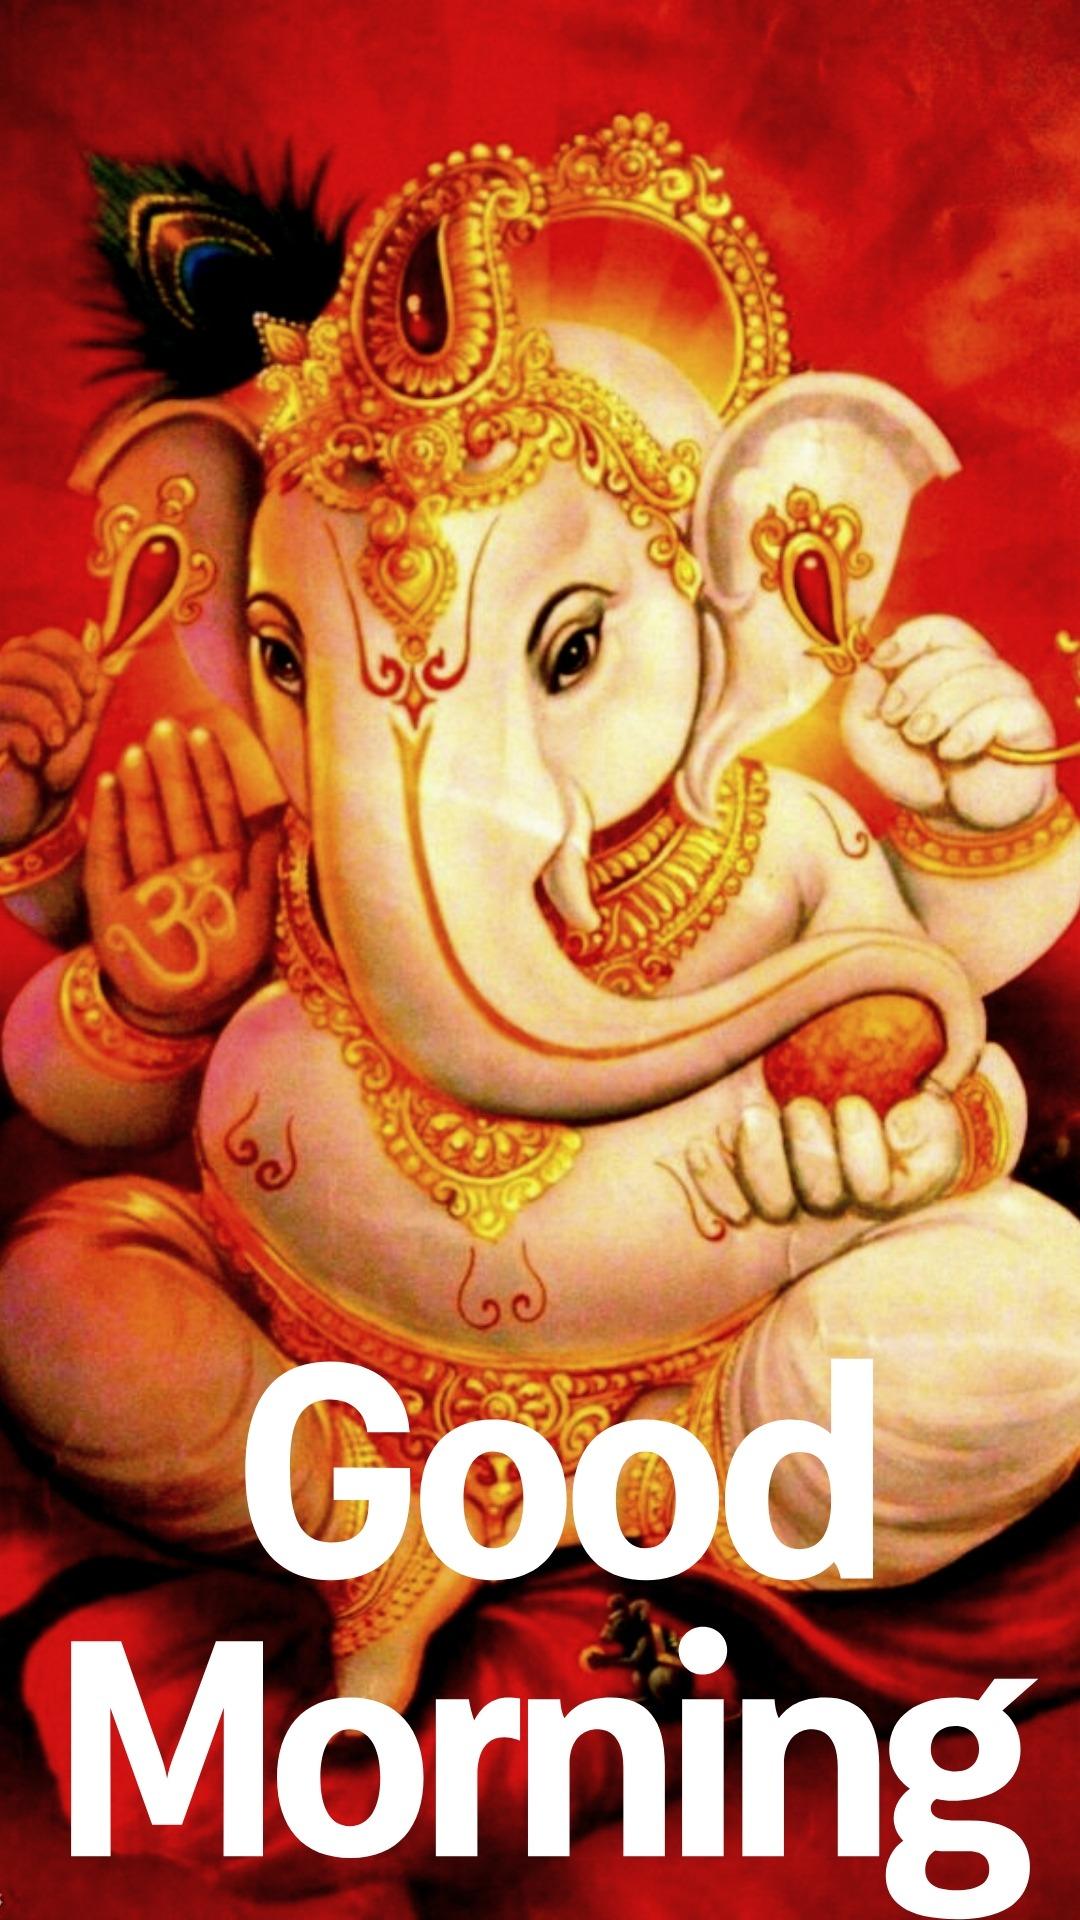 good morning images with ganesha